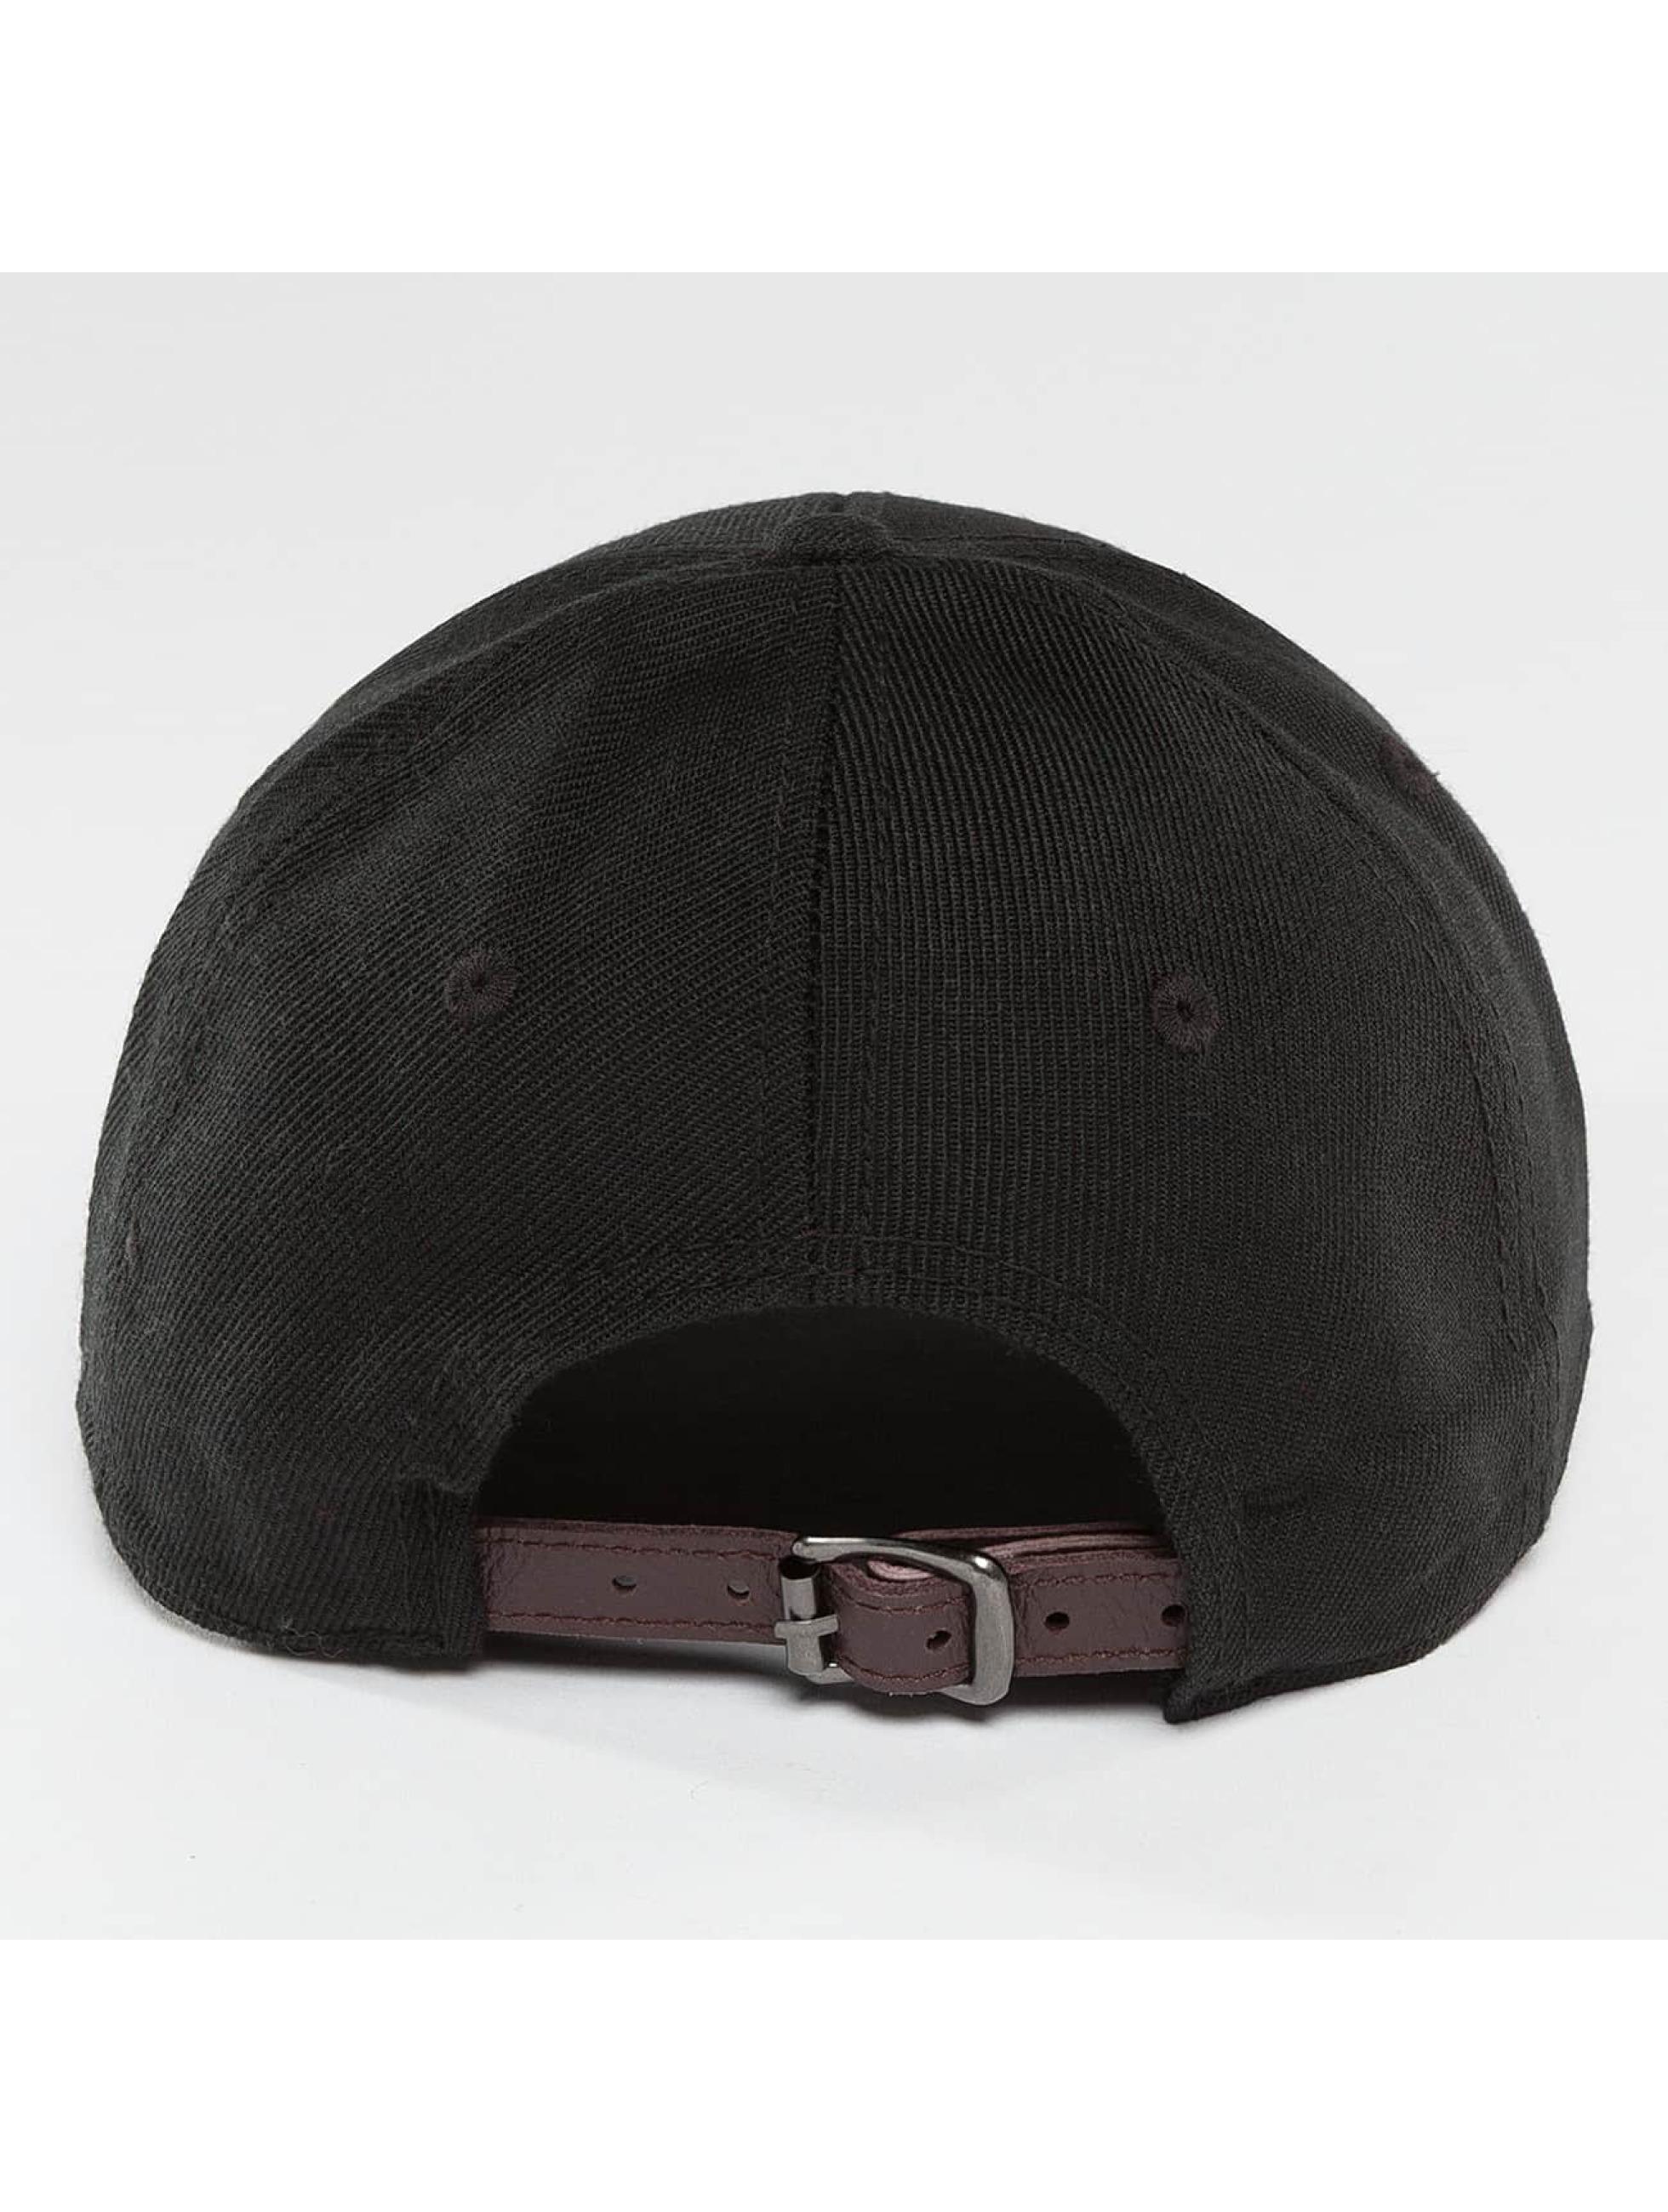 Pusher Apparel Casquette Snapback & Strapback Polo noir